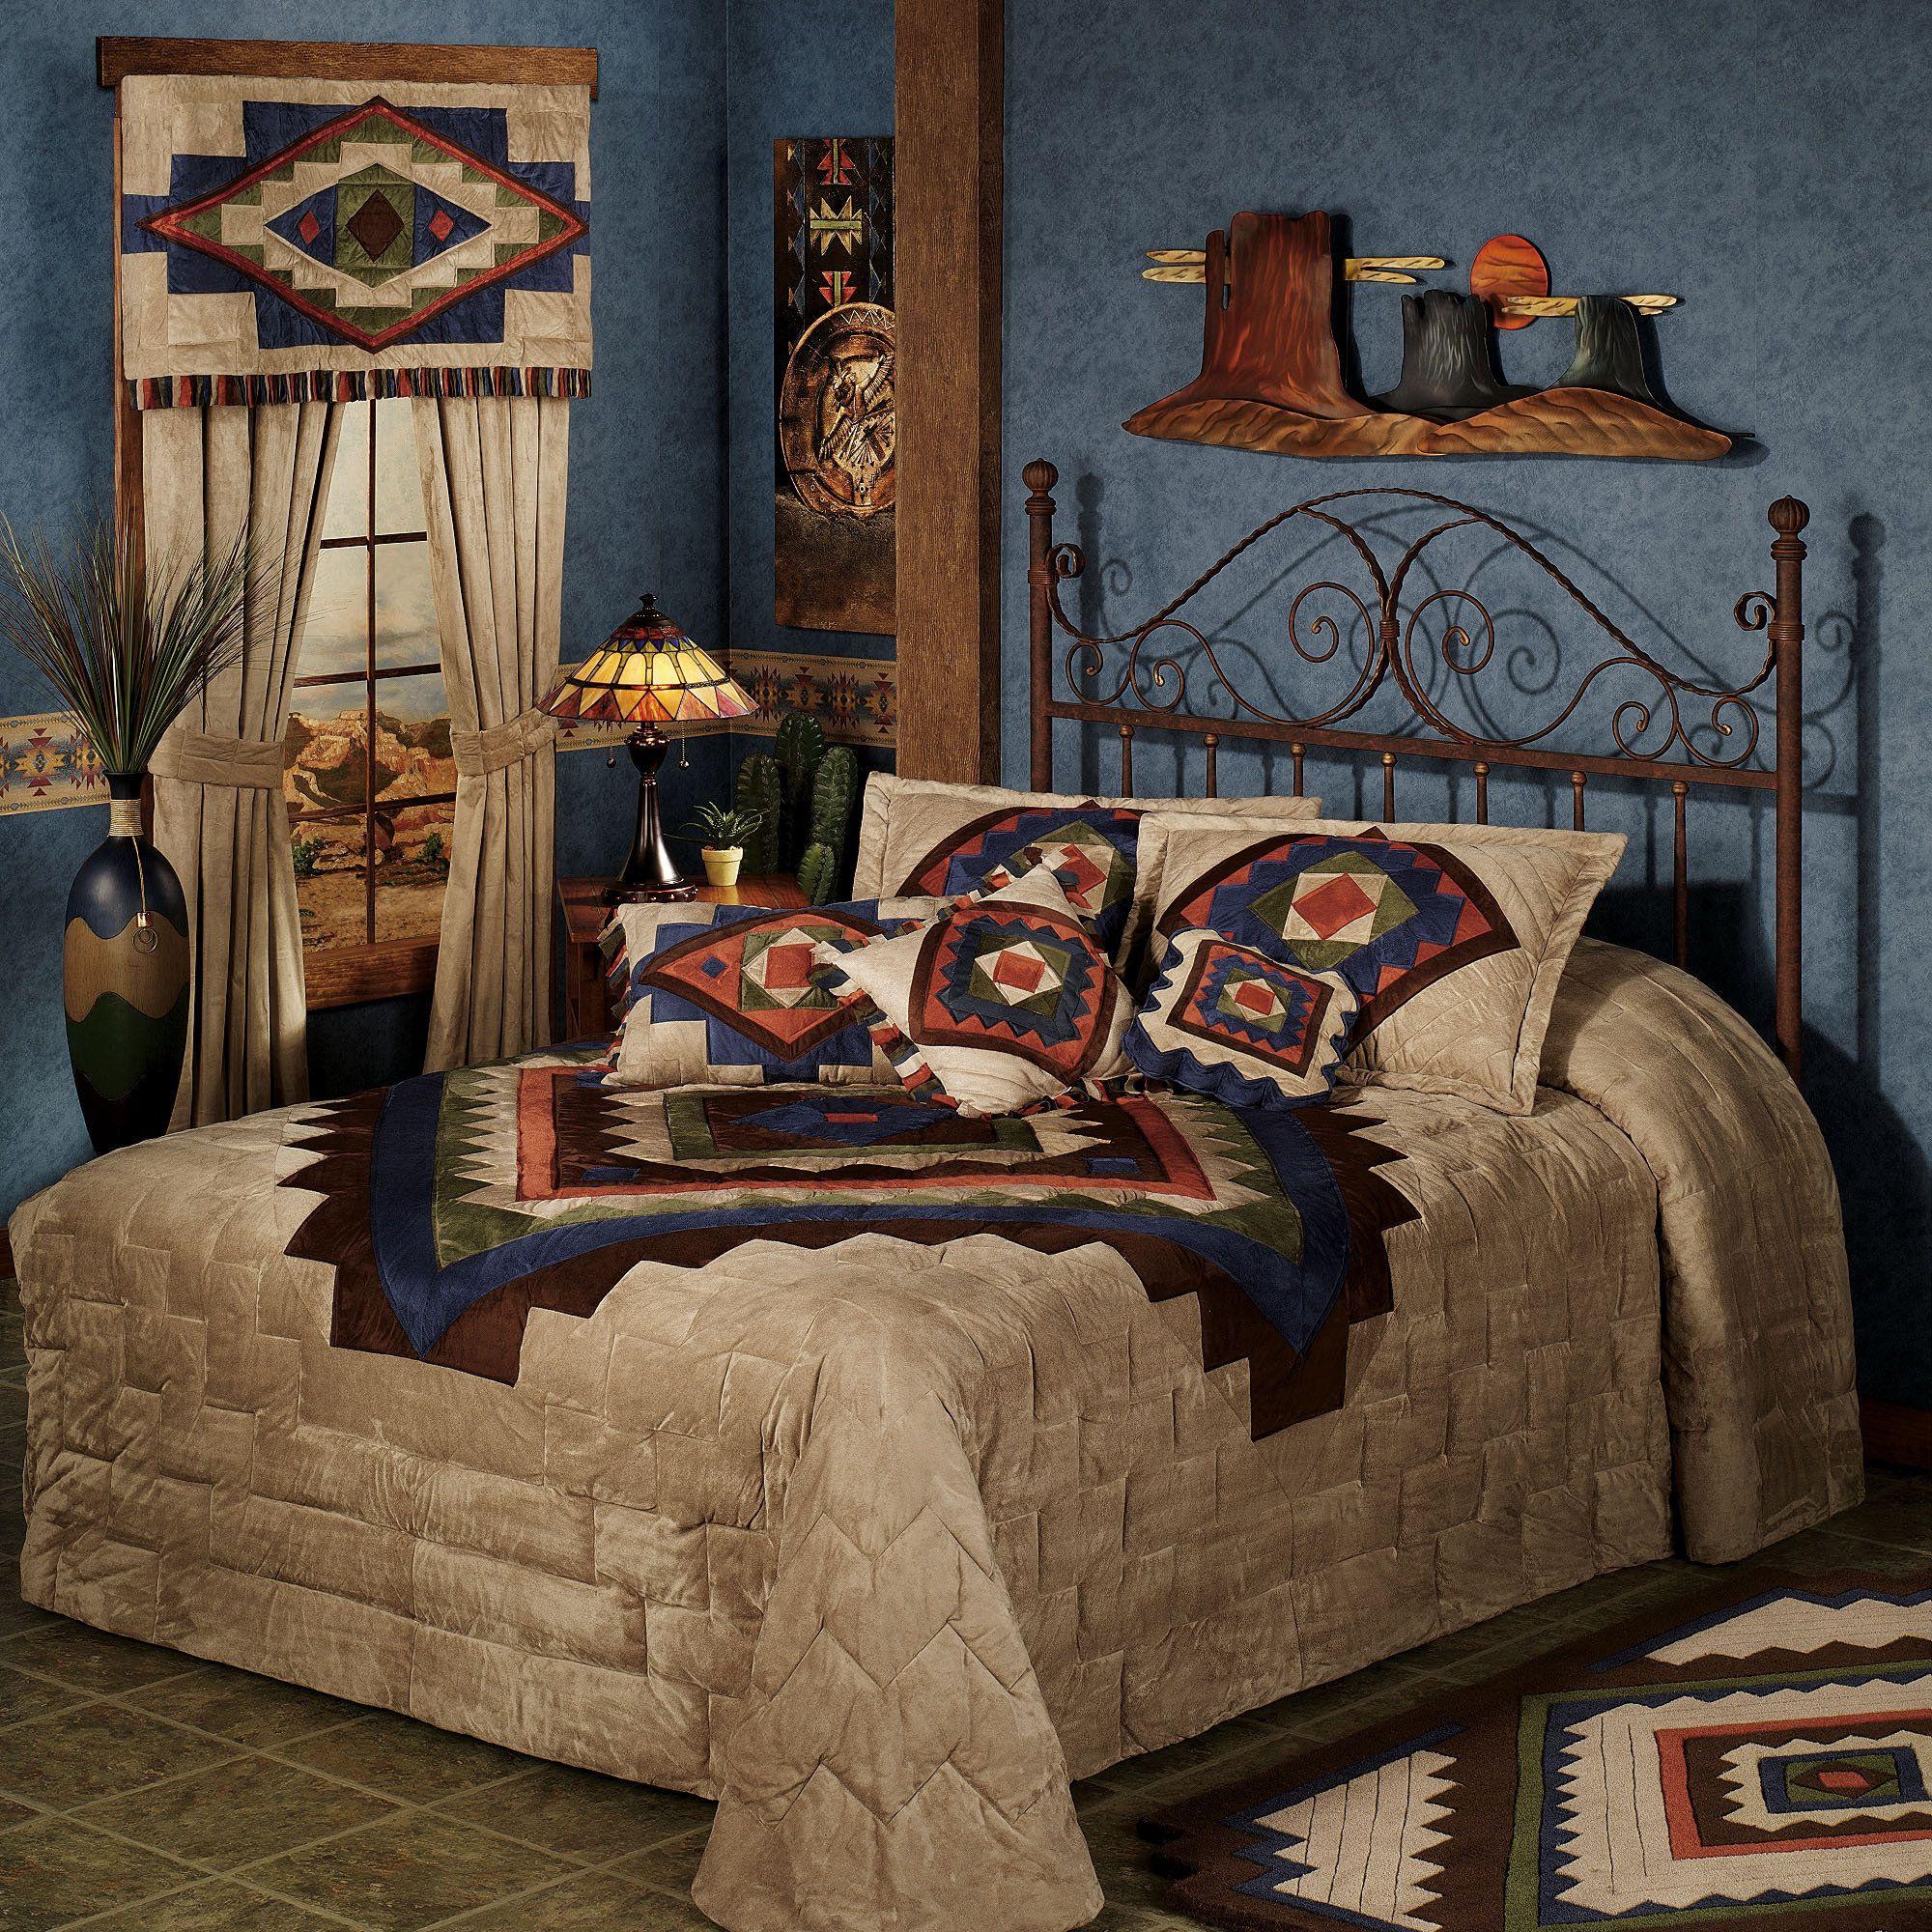 Room Decor Furniture: Southwestern Furniture And Decor